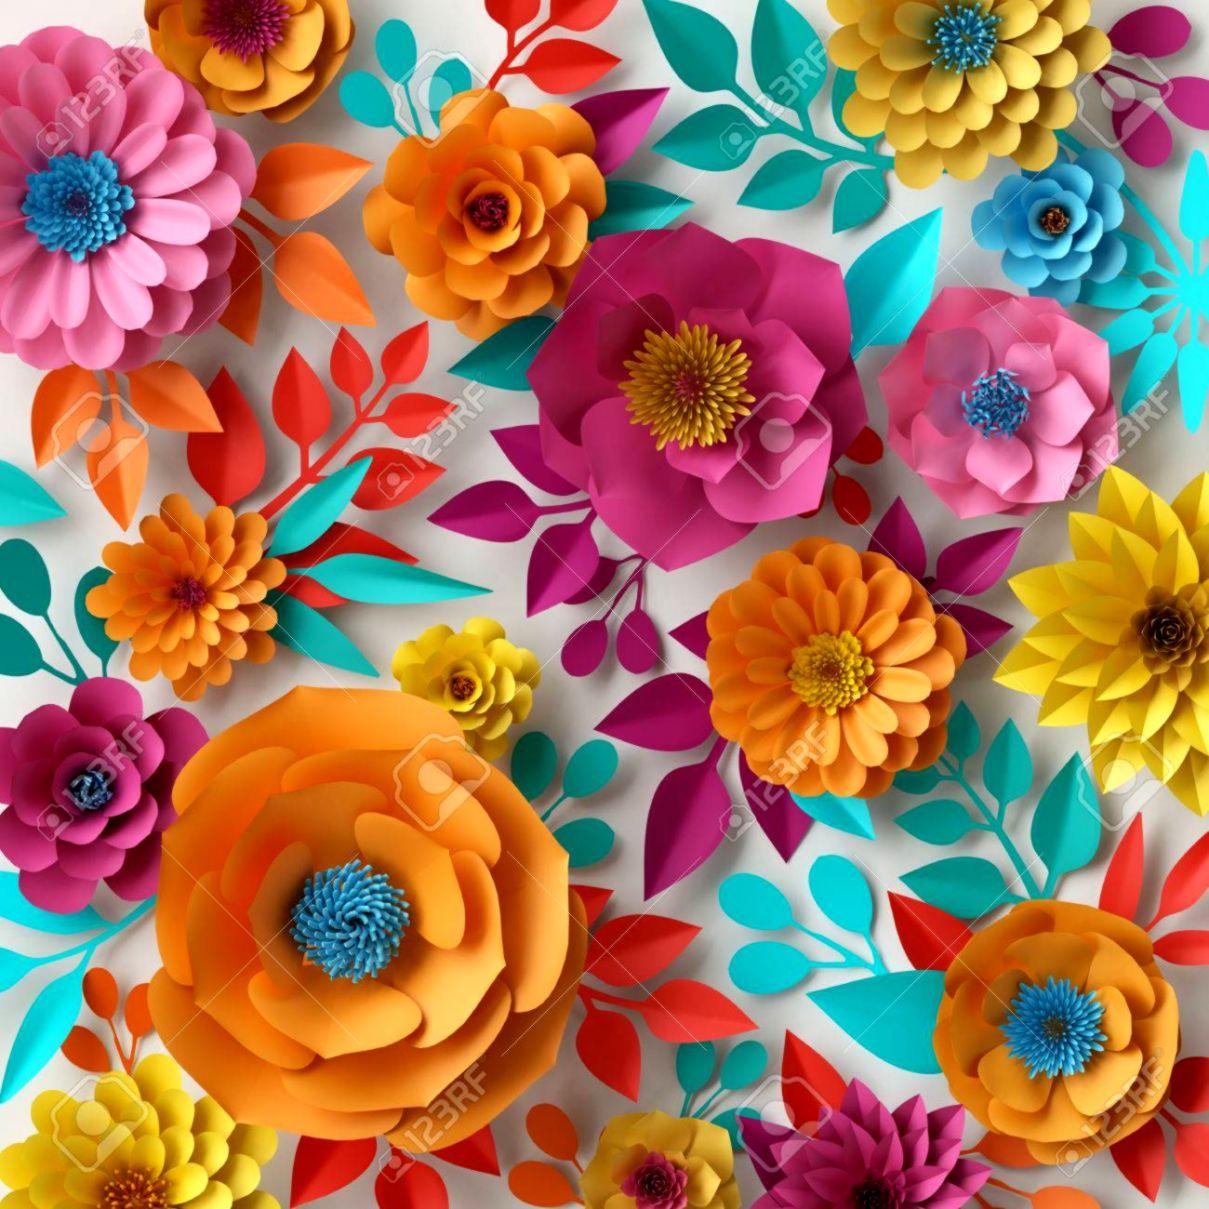 3D Wallpaper Of Spring Flowers